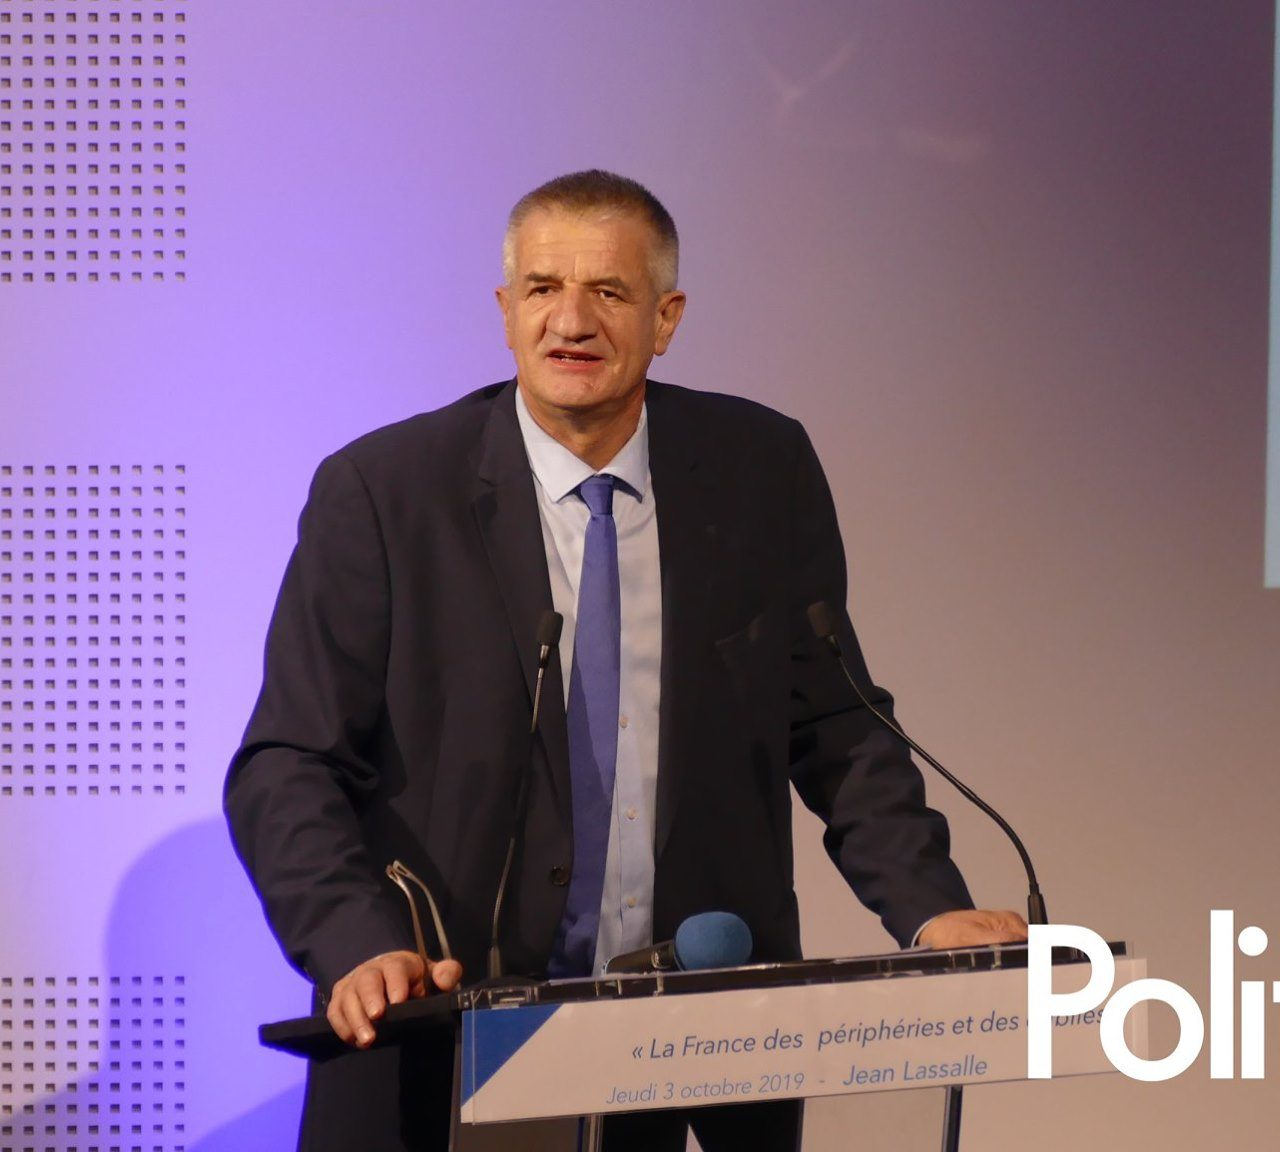 https://politeia-ices.fr/wp-content/uploads/2021/02/Conférence_Lassalle_201974-1280x1152.jpg